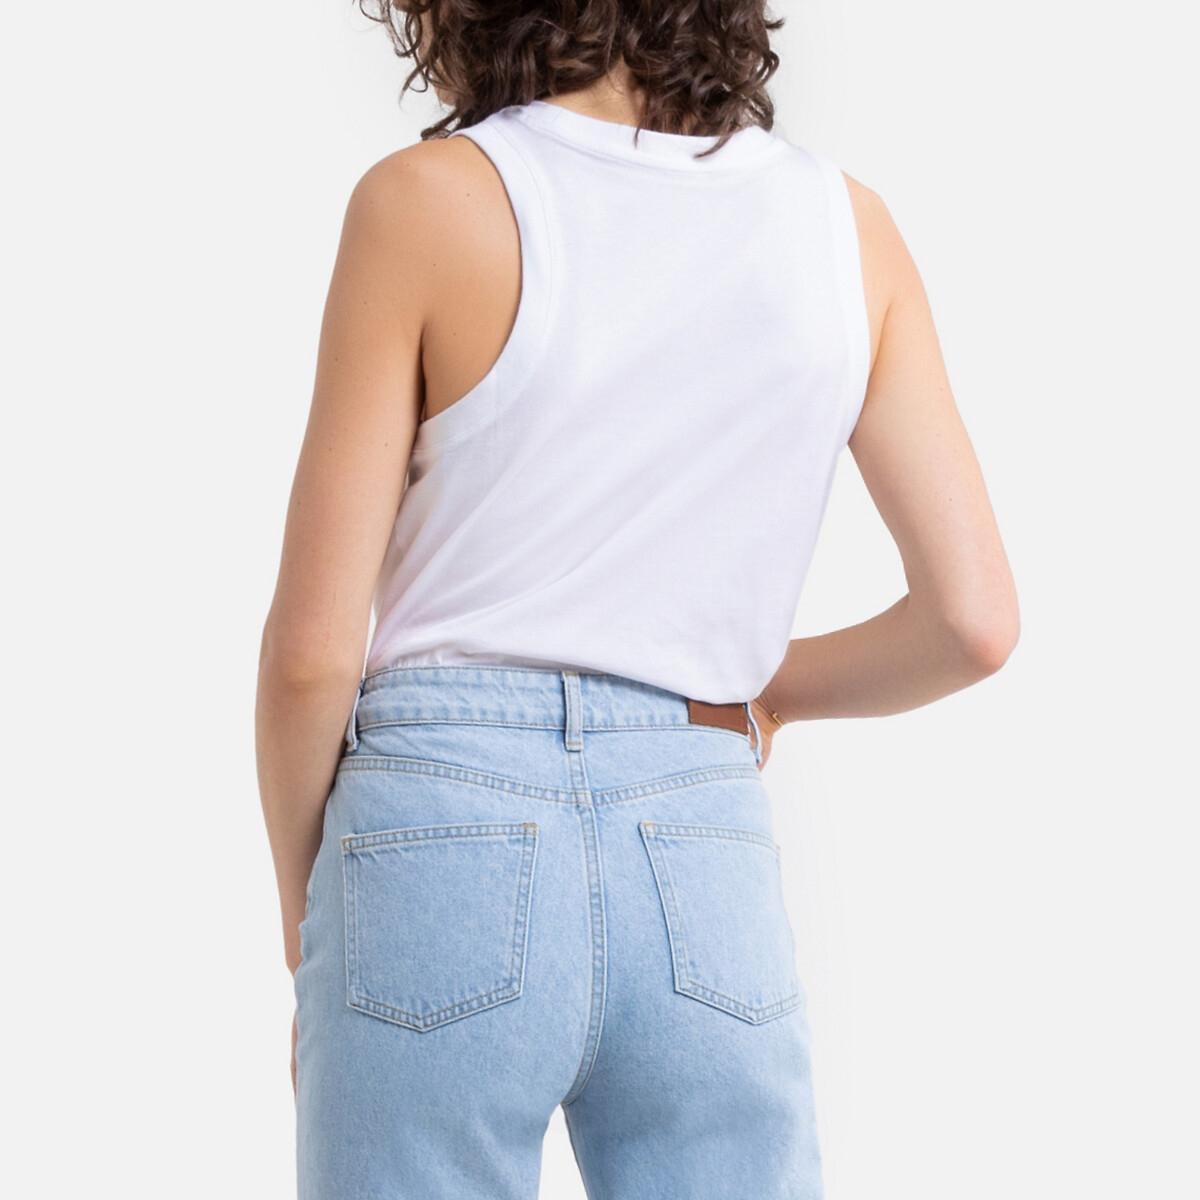 Camiseta de tirantes Star Chevron 100% algodón